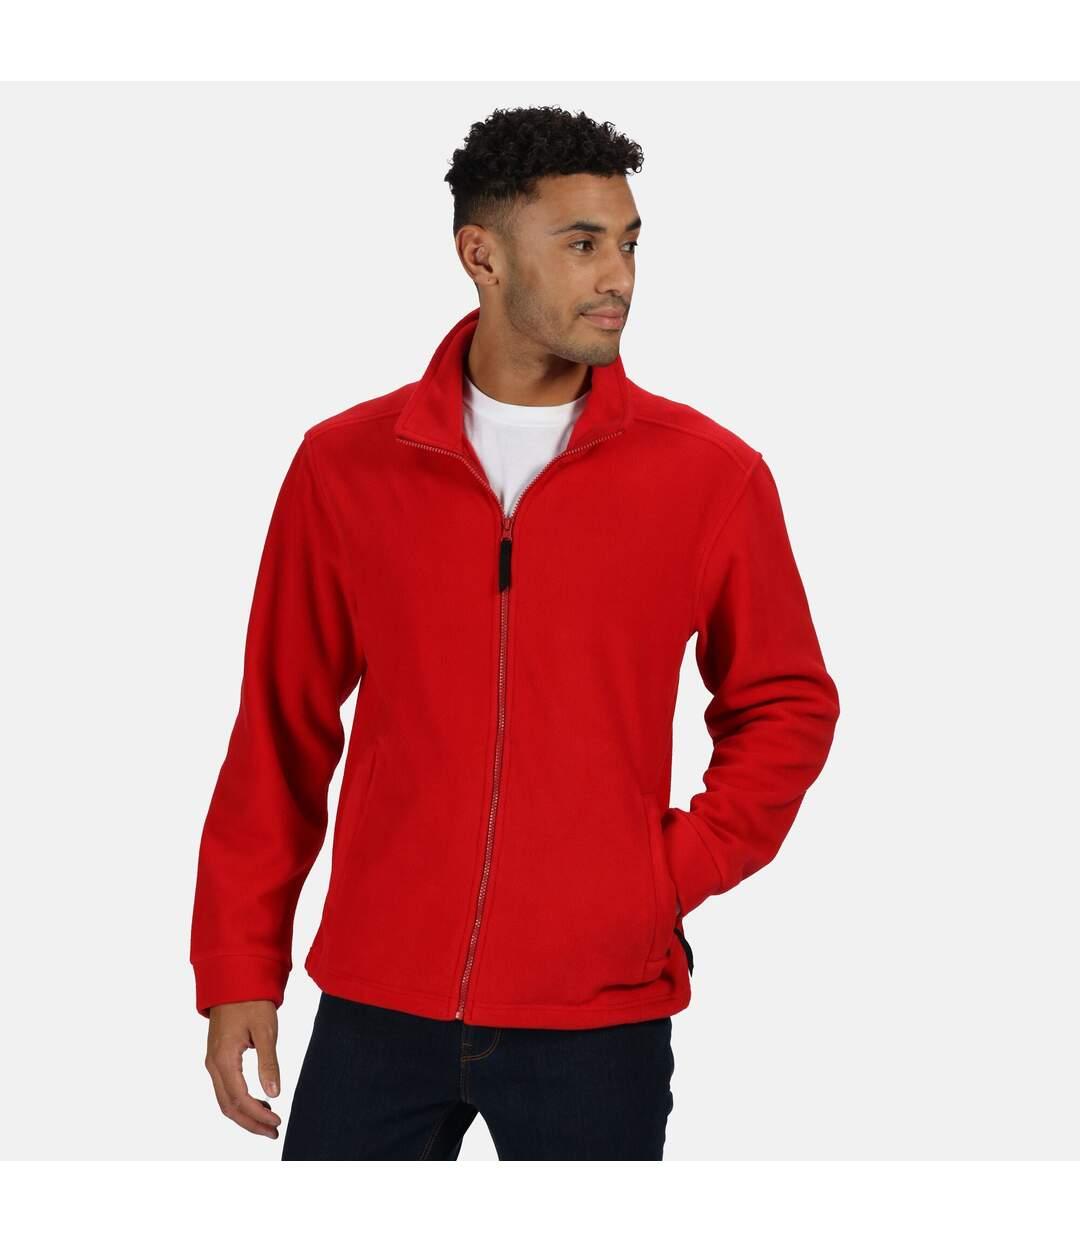 Regatta Professional Mens Thor 300 Fleece Jacket (Classic Red) - UTRW3990